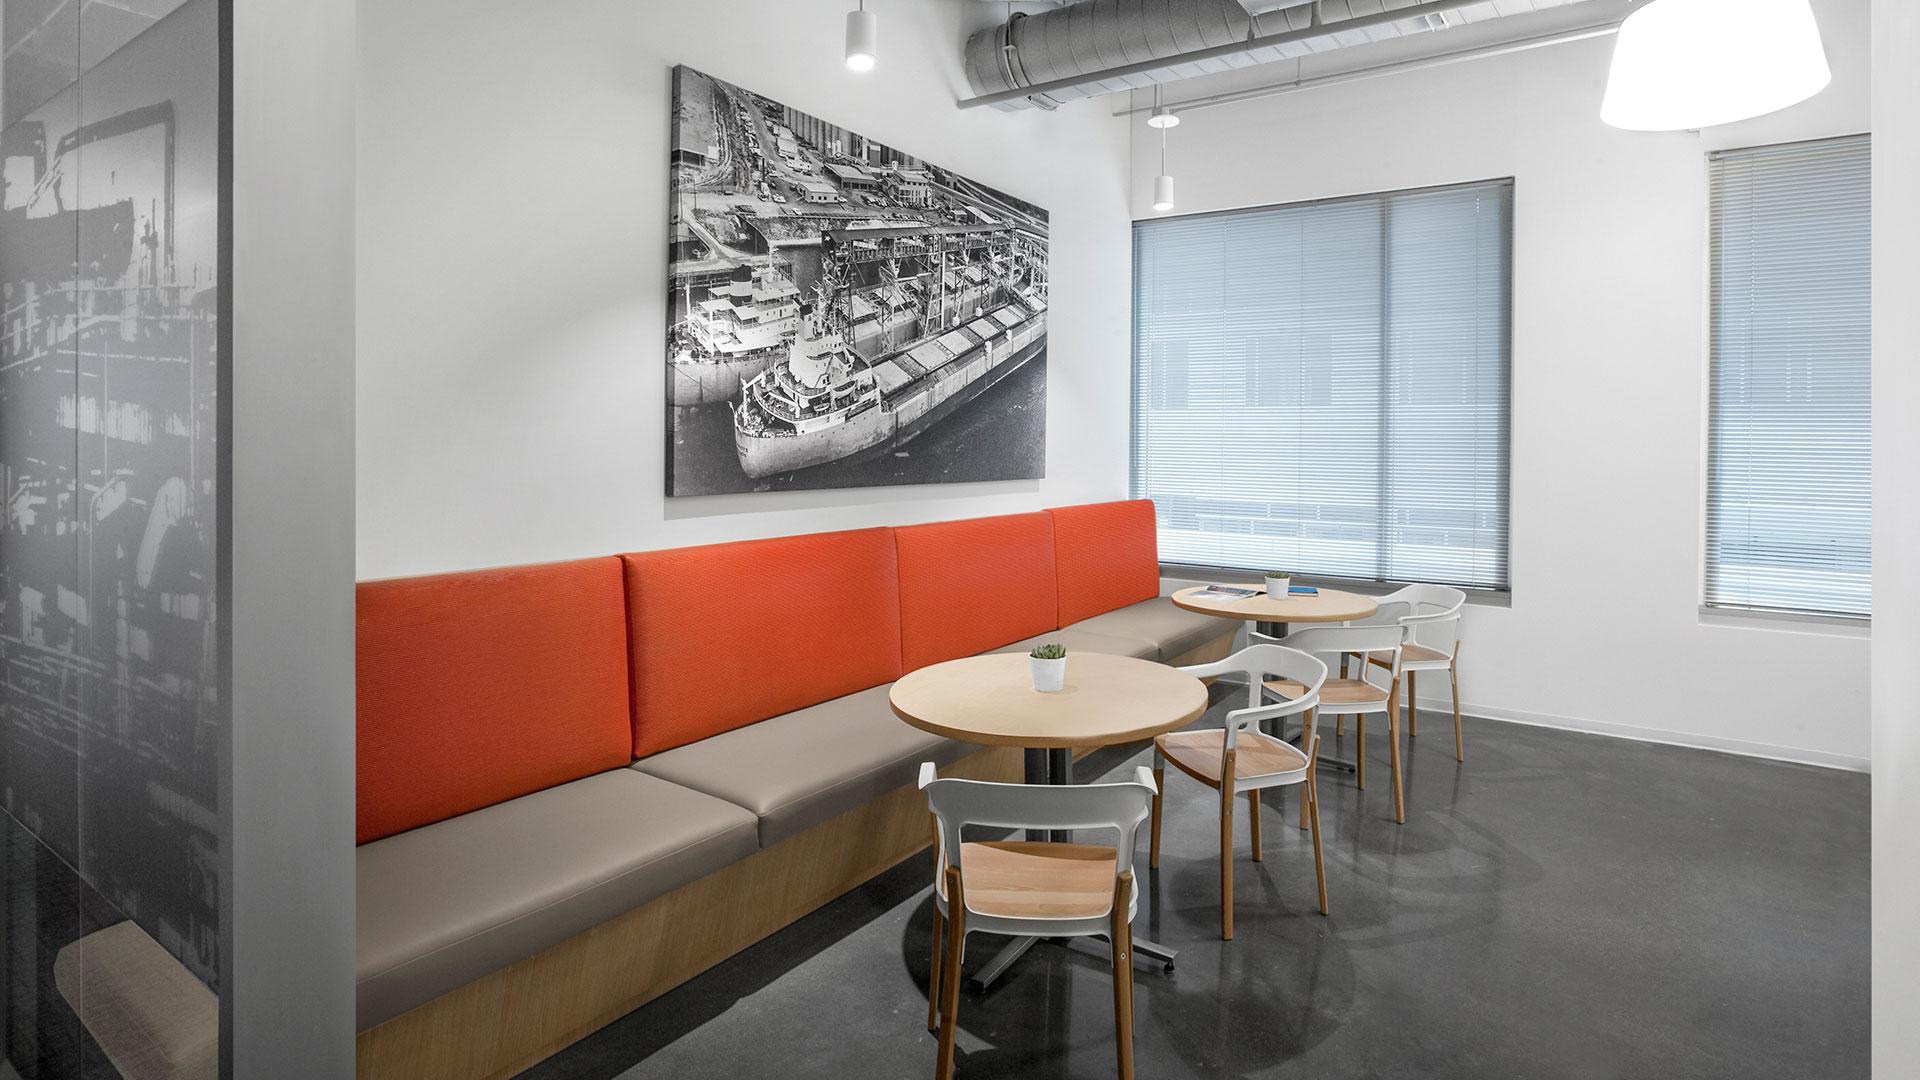 Corporate Interior Design City Center Houston Breakroom Banquette Seating Dining